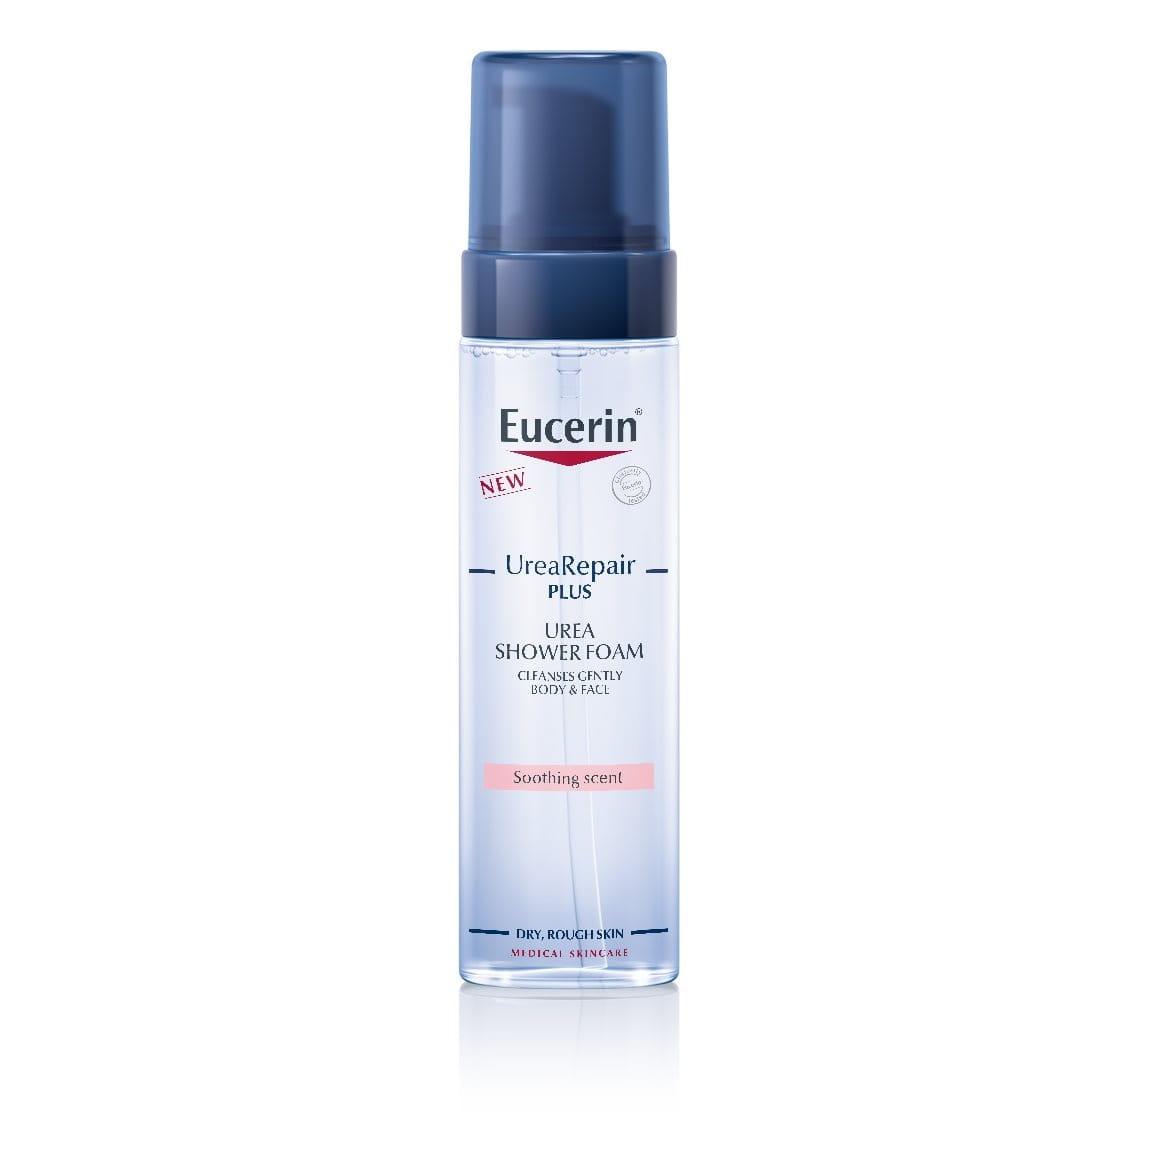 Shower foam for dry skin from Eucerin